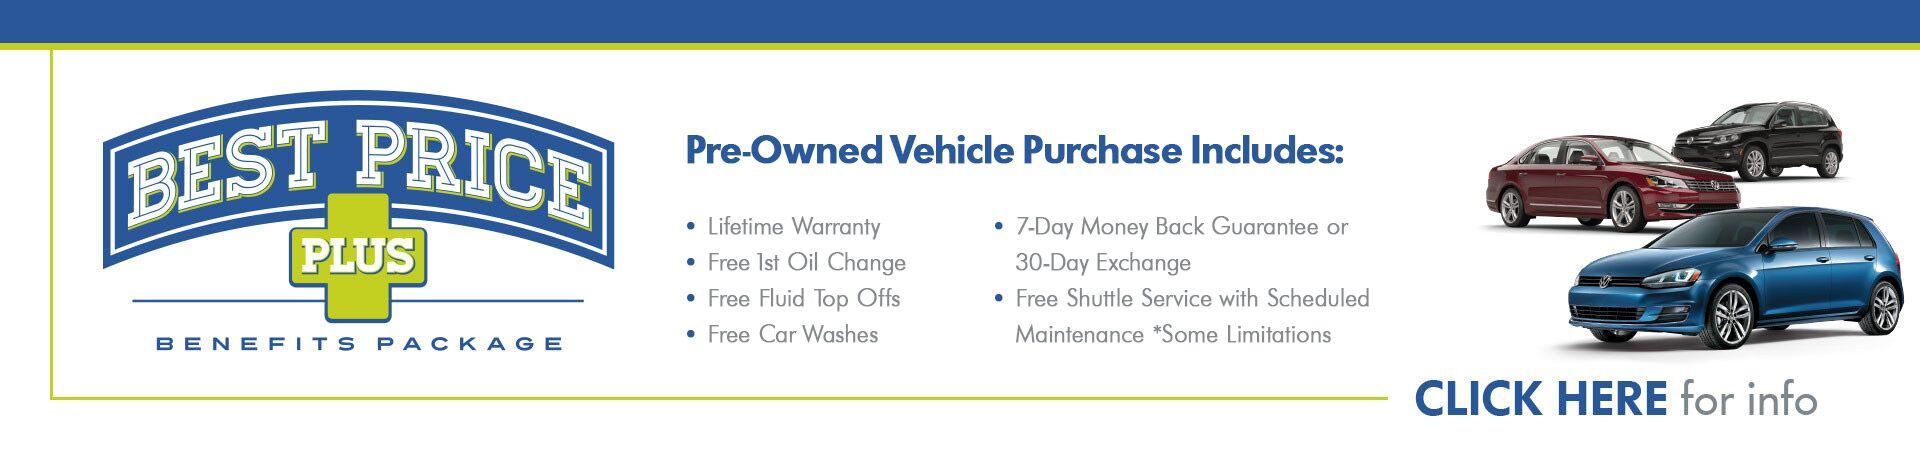 https://cdn-ds.com/media/websites/1454/content/Slides-vwofinvergrove-2015-best-price-used-car.jpg?s=155247